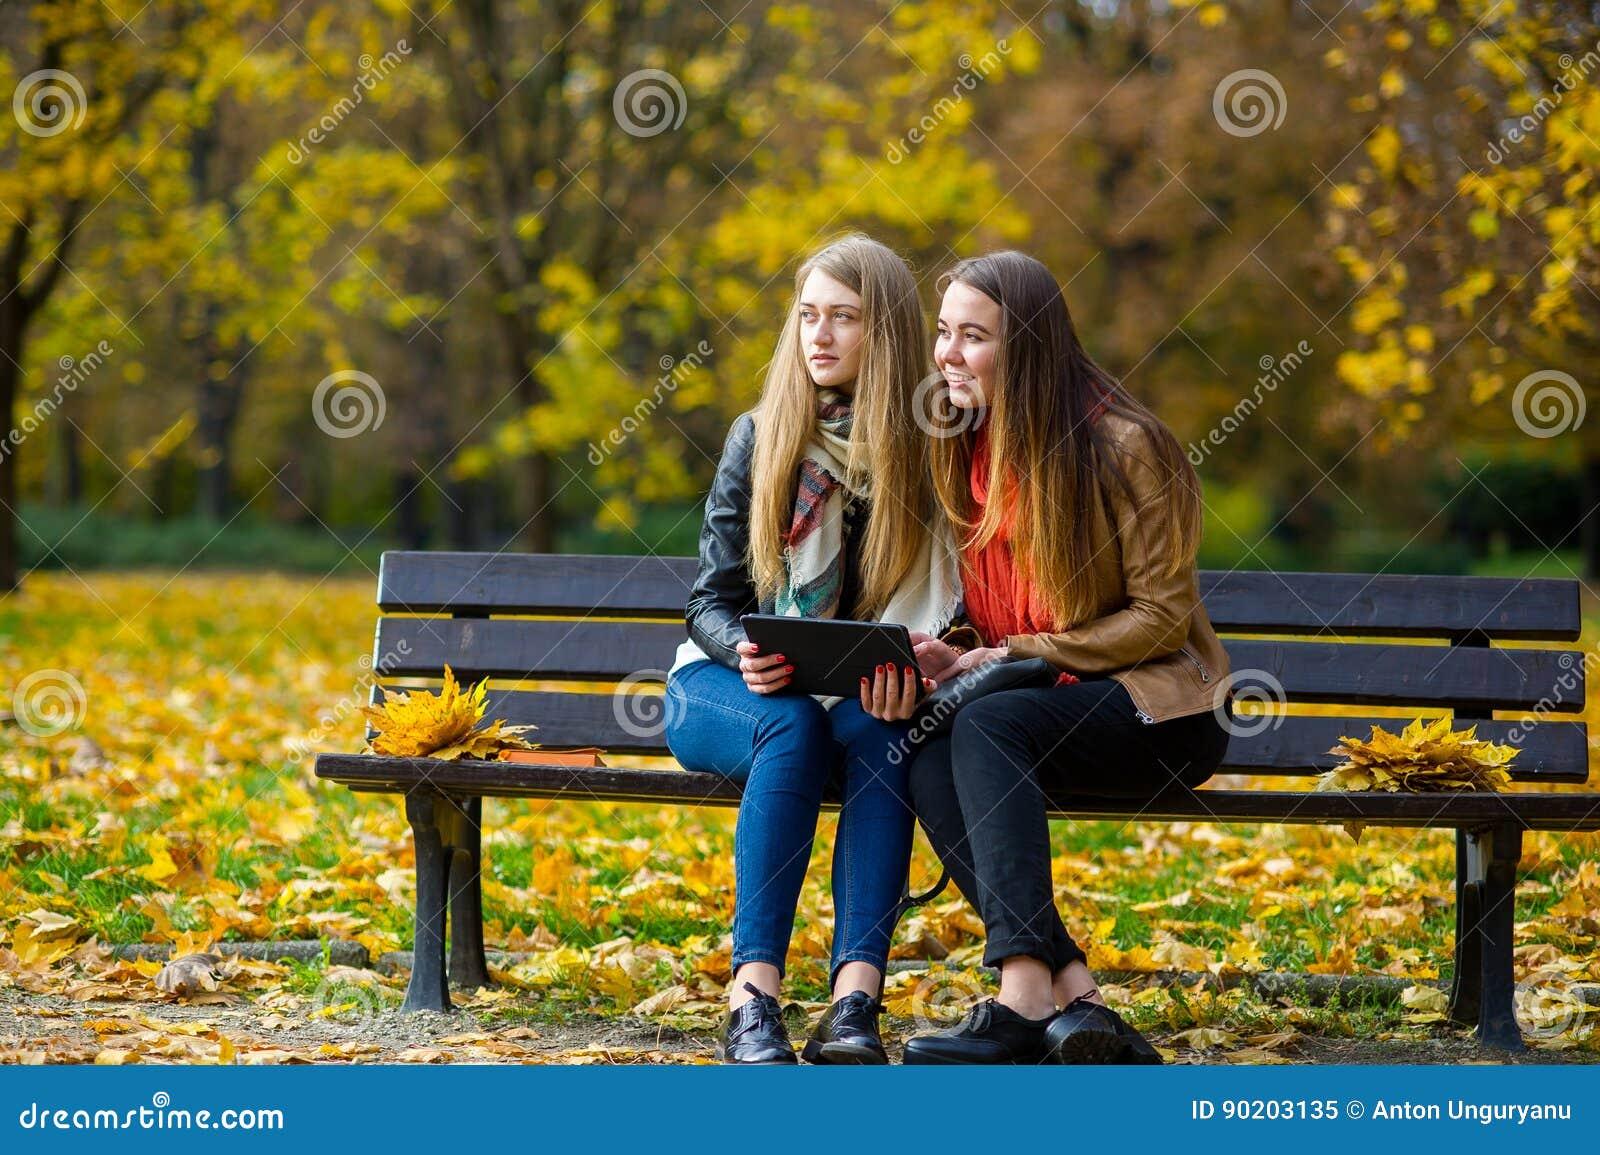 Студентку в парке 12